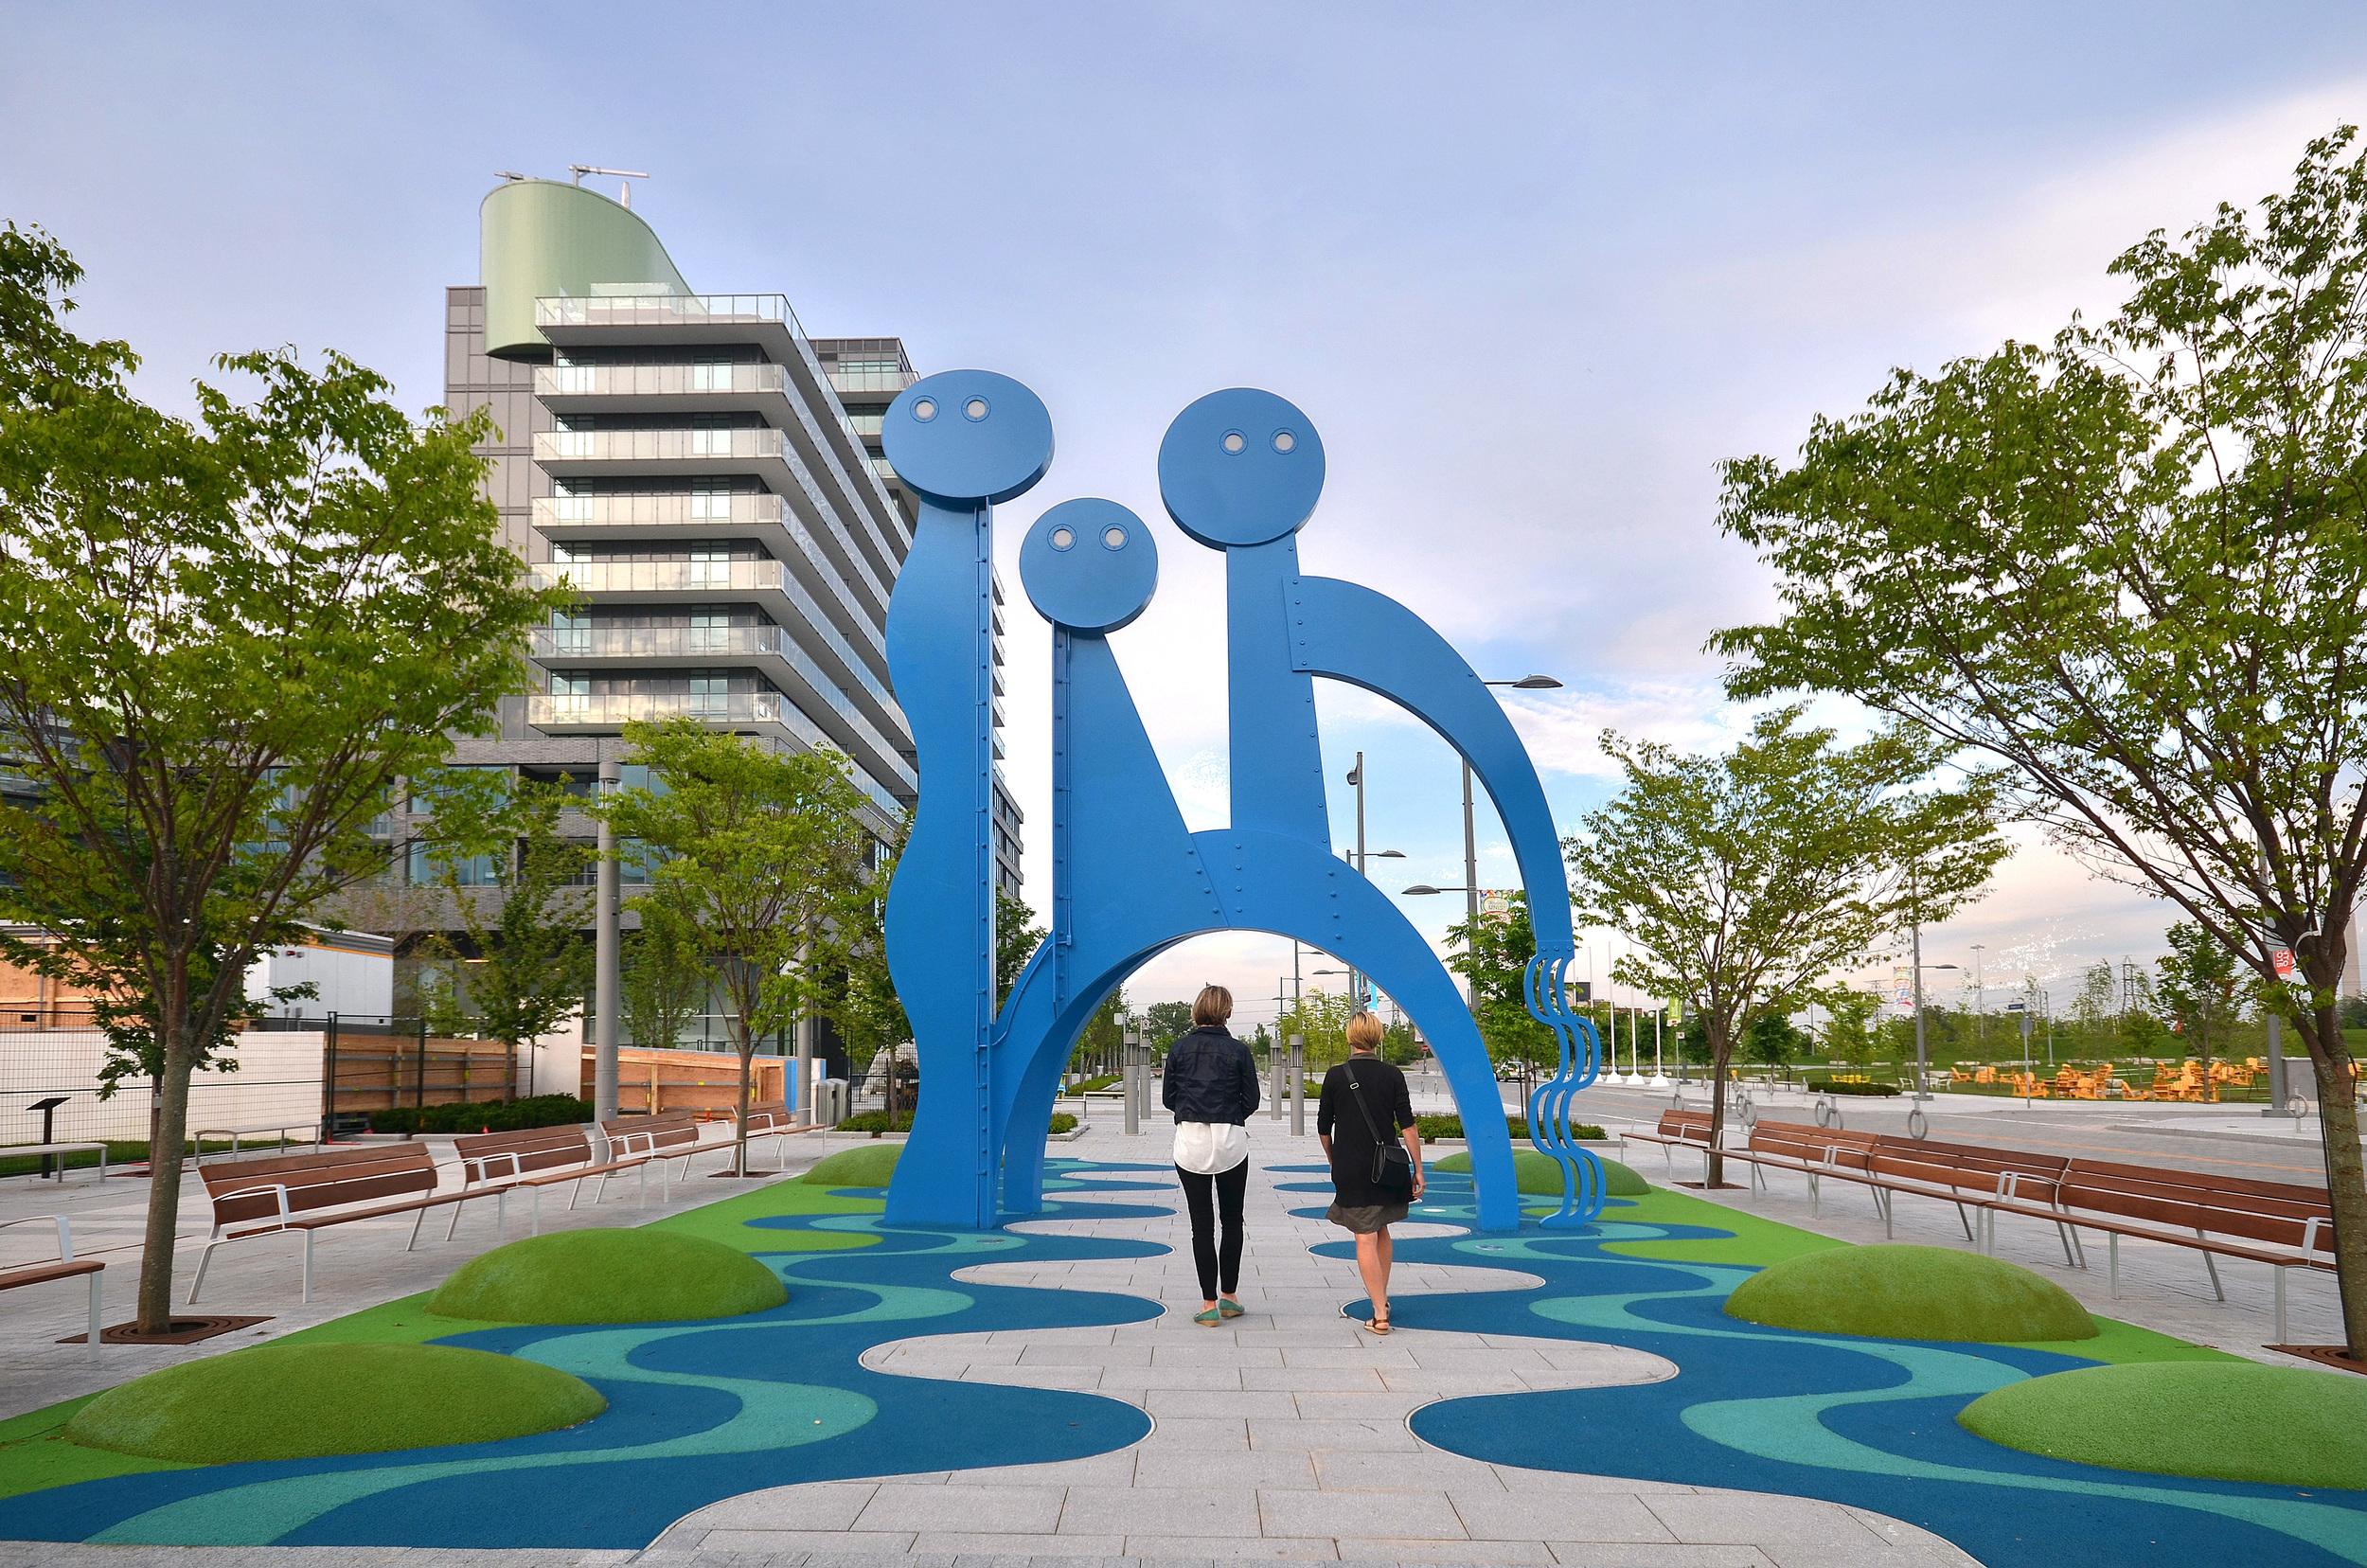 Photo: Nicola Betts for Waterfront Toronto